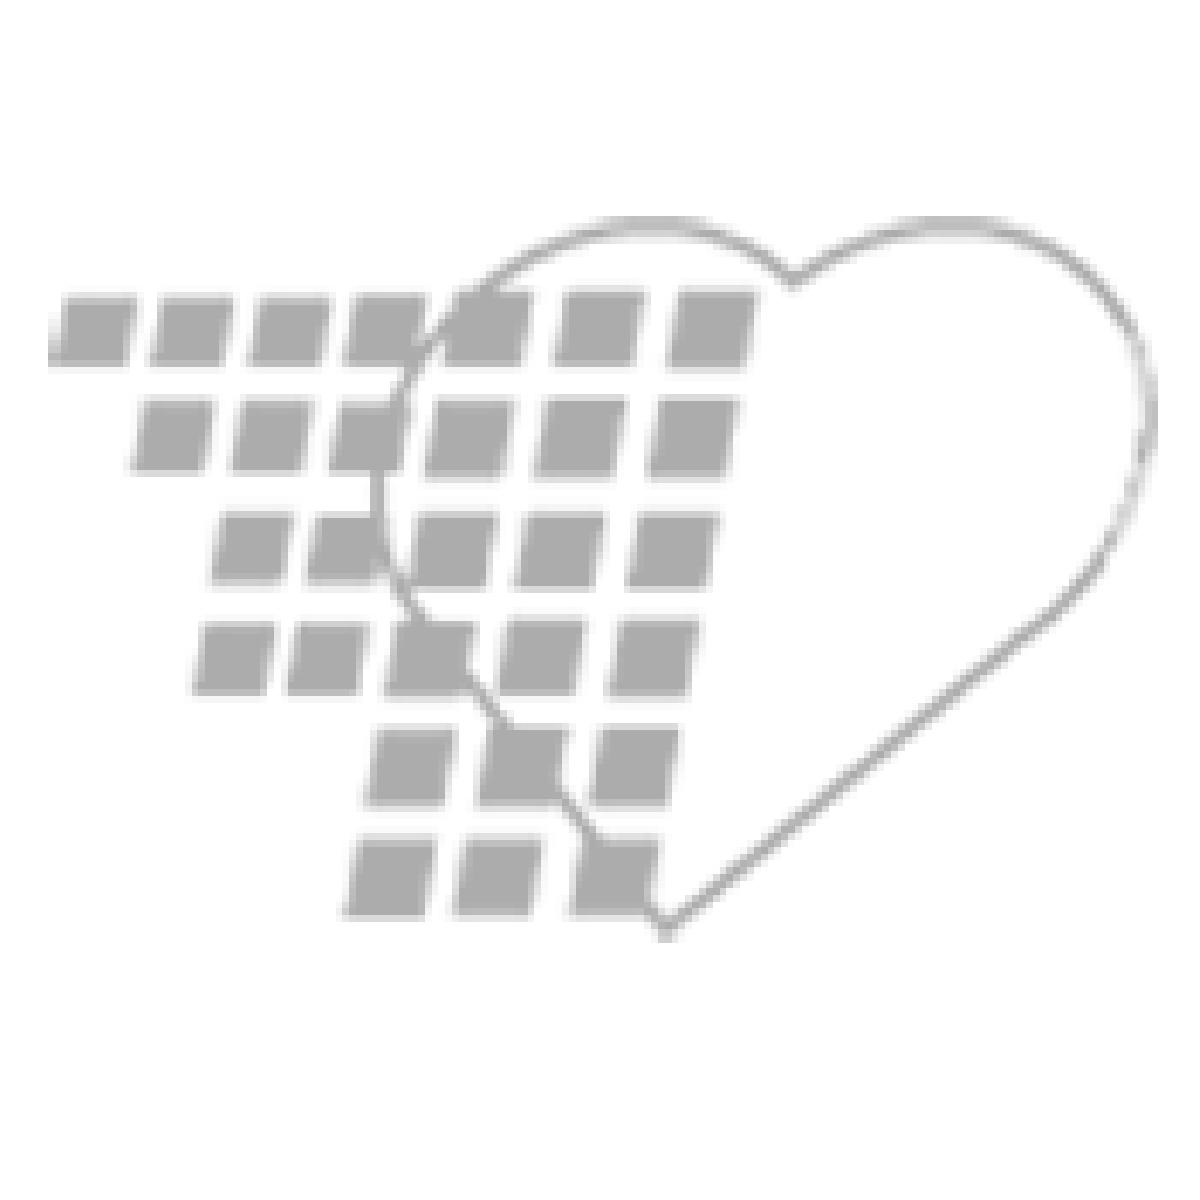 12-81-0009-BGE - SimLeggings® Pediatric One Year Old Pair - Beige